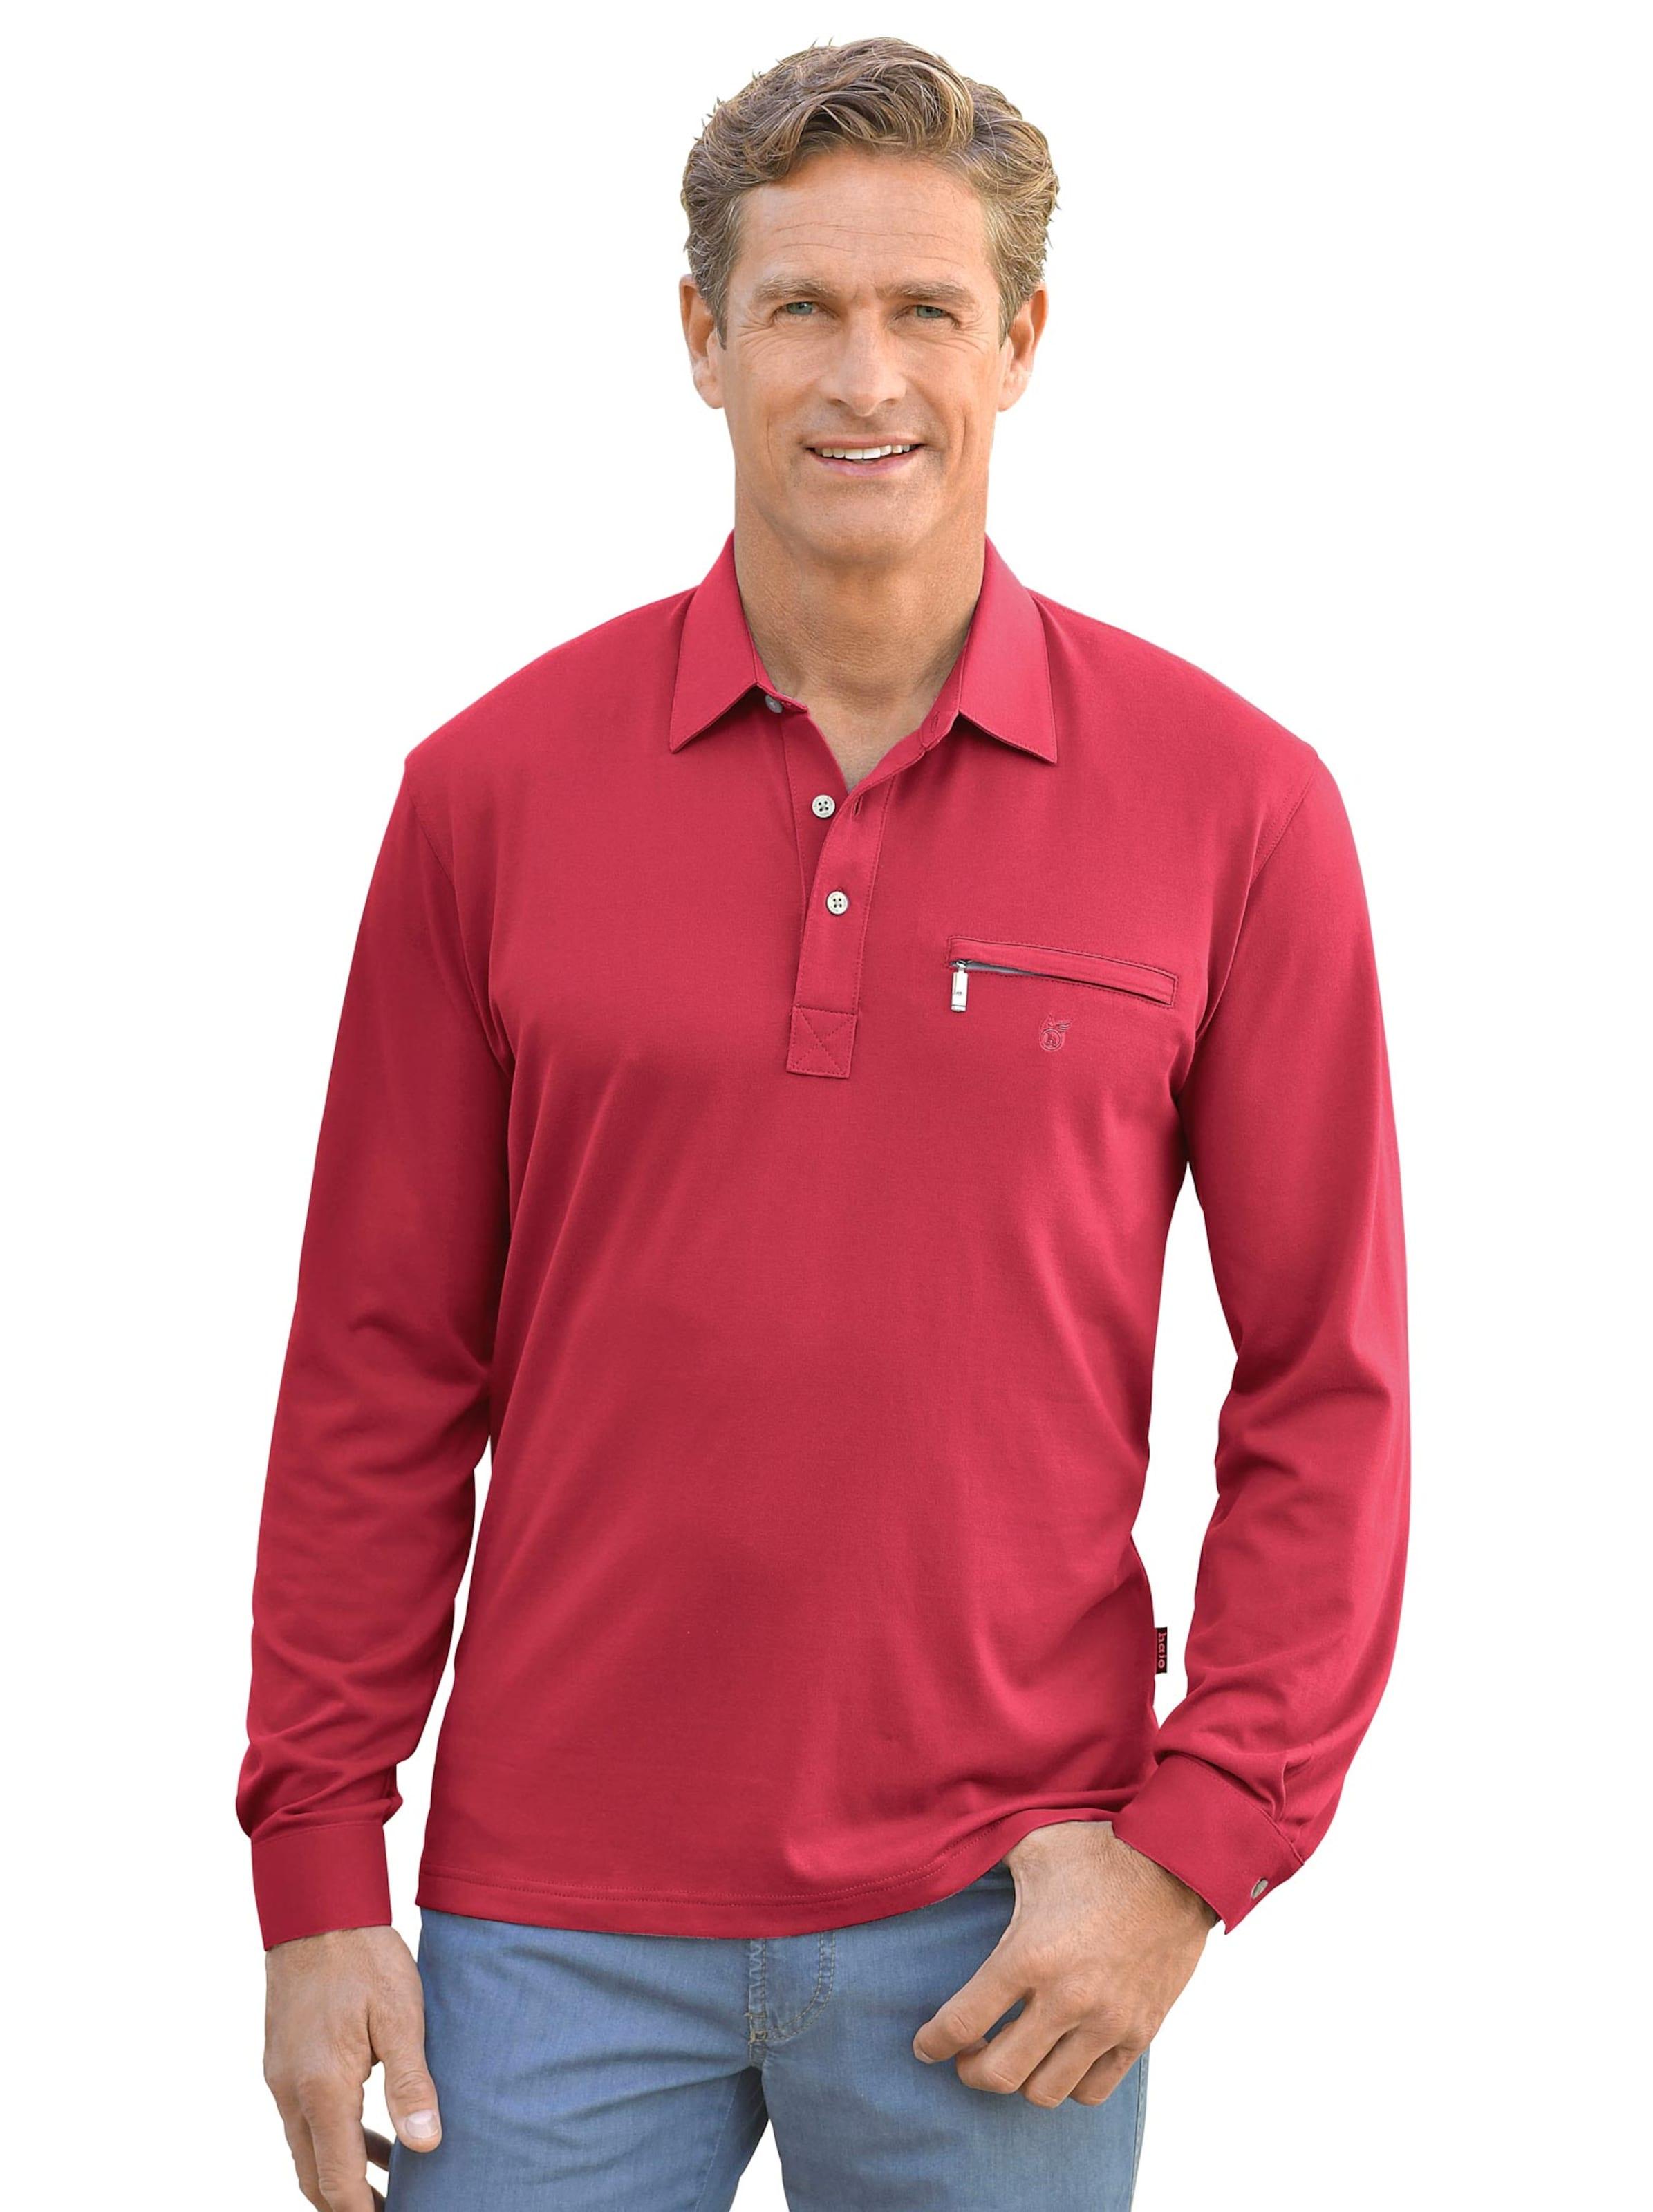 hajo - Herren Langarm-Shirt rot